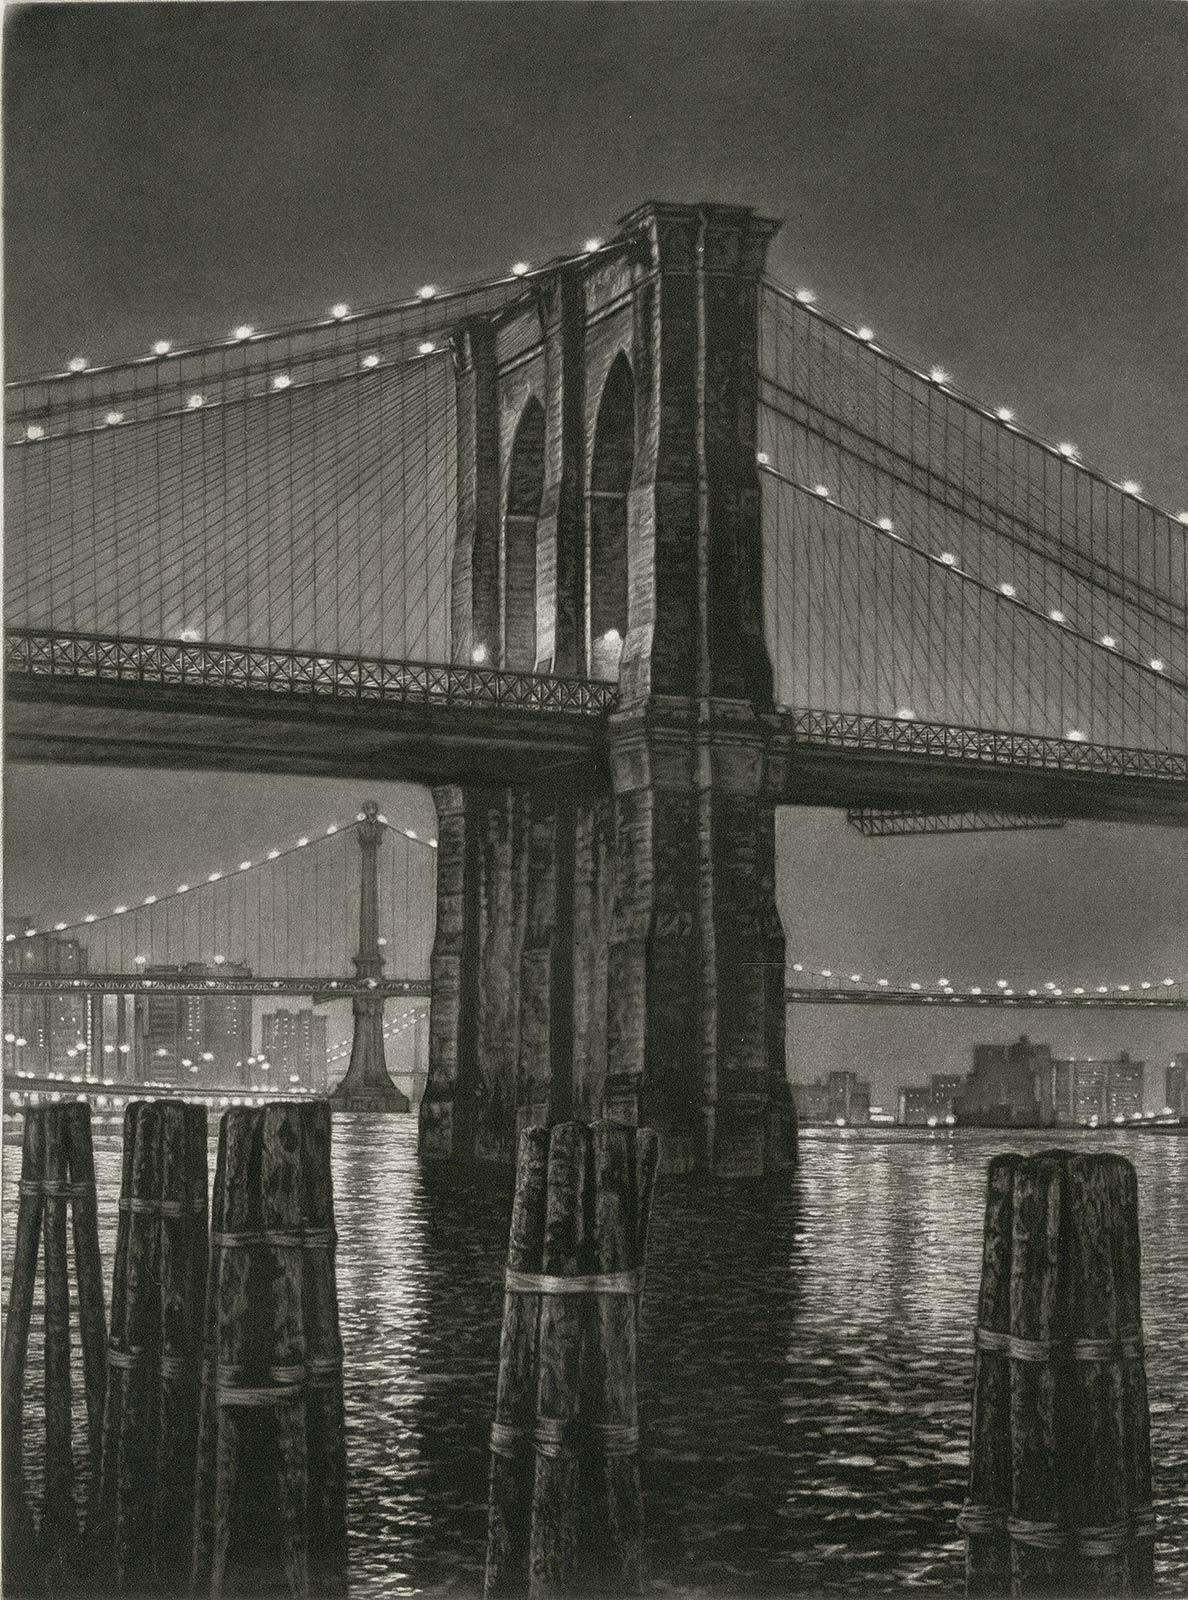 Pylon (Brooklyn Bridge from Manhattan side of East River near South St. Seaport)